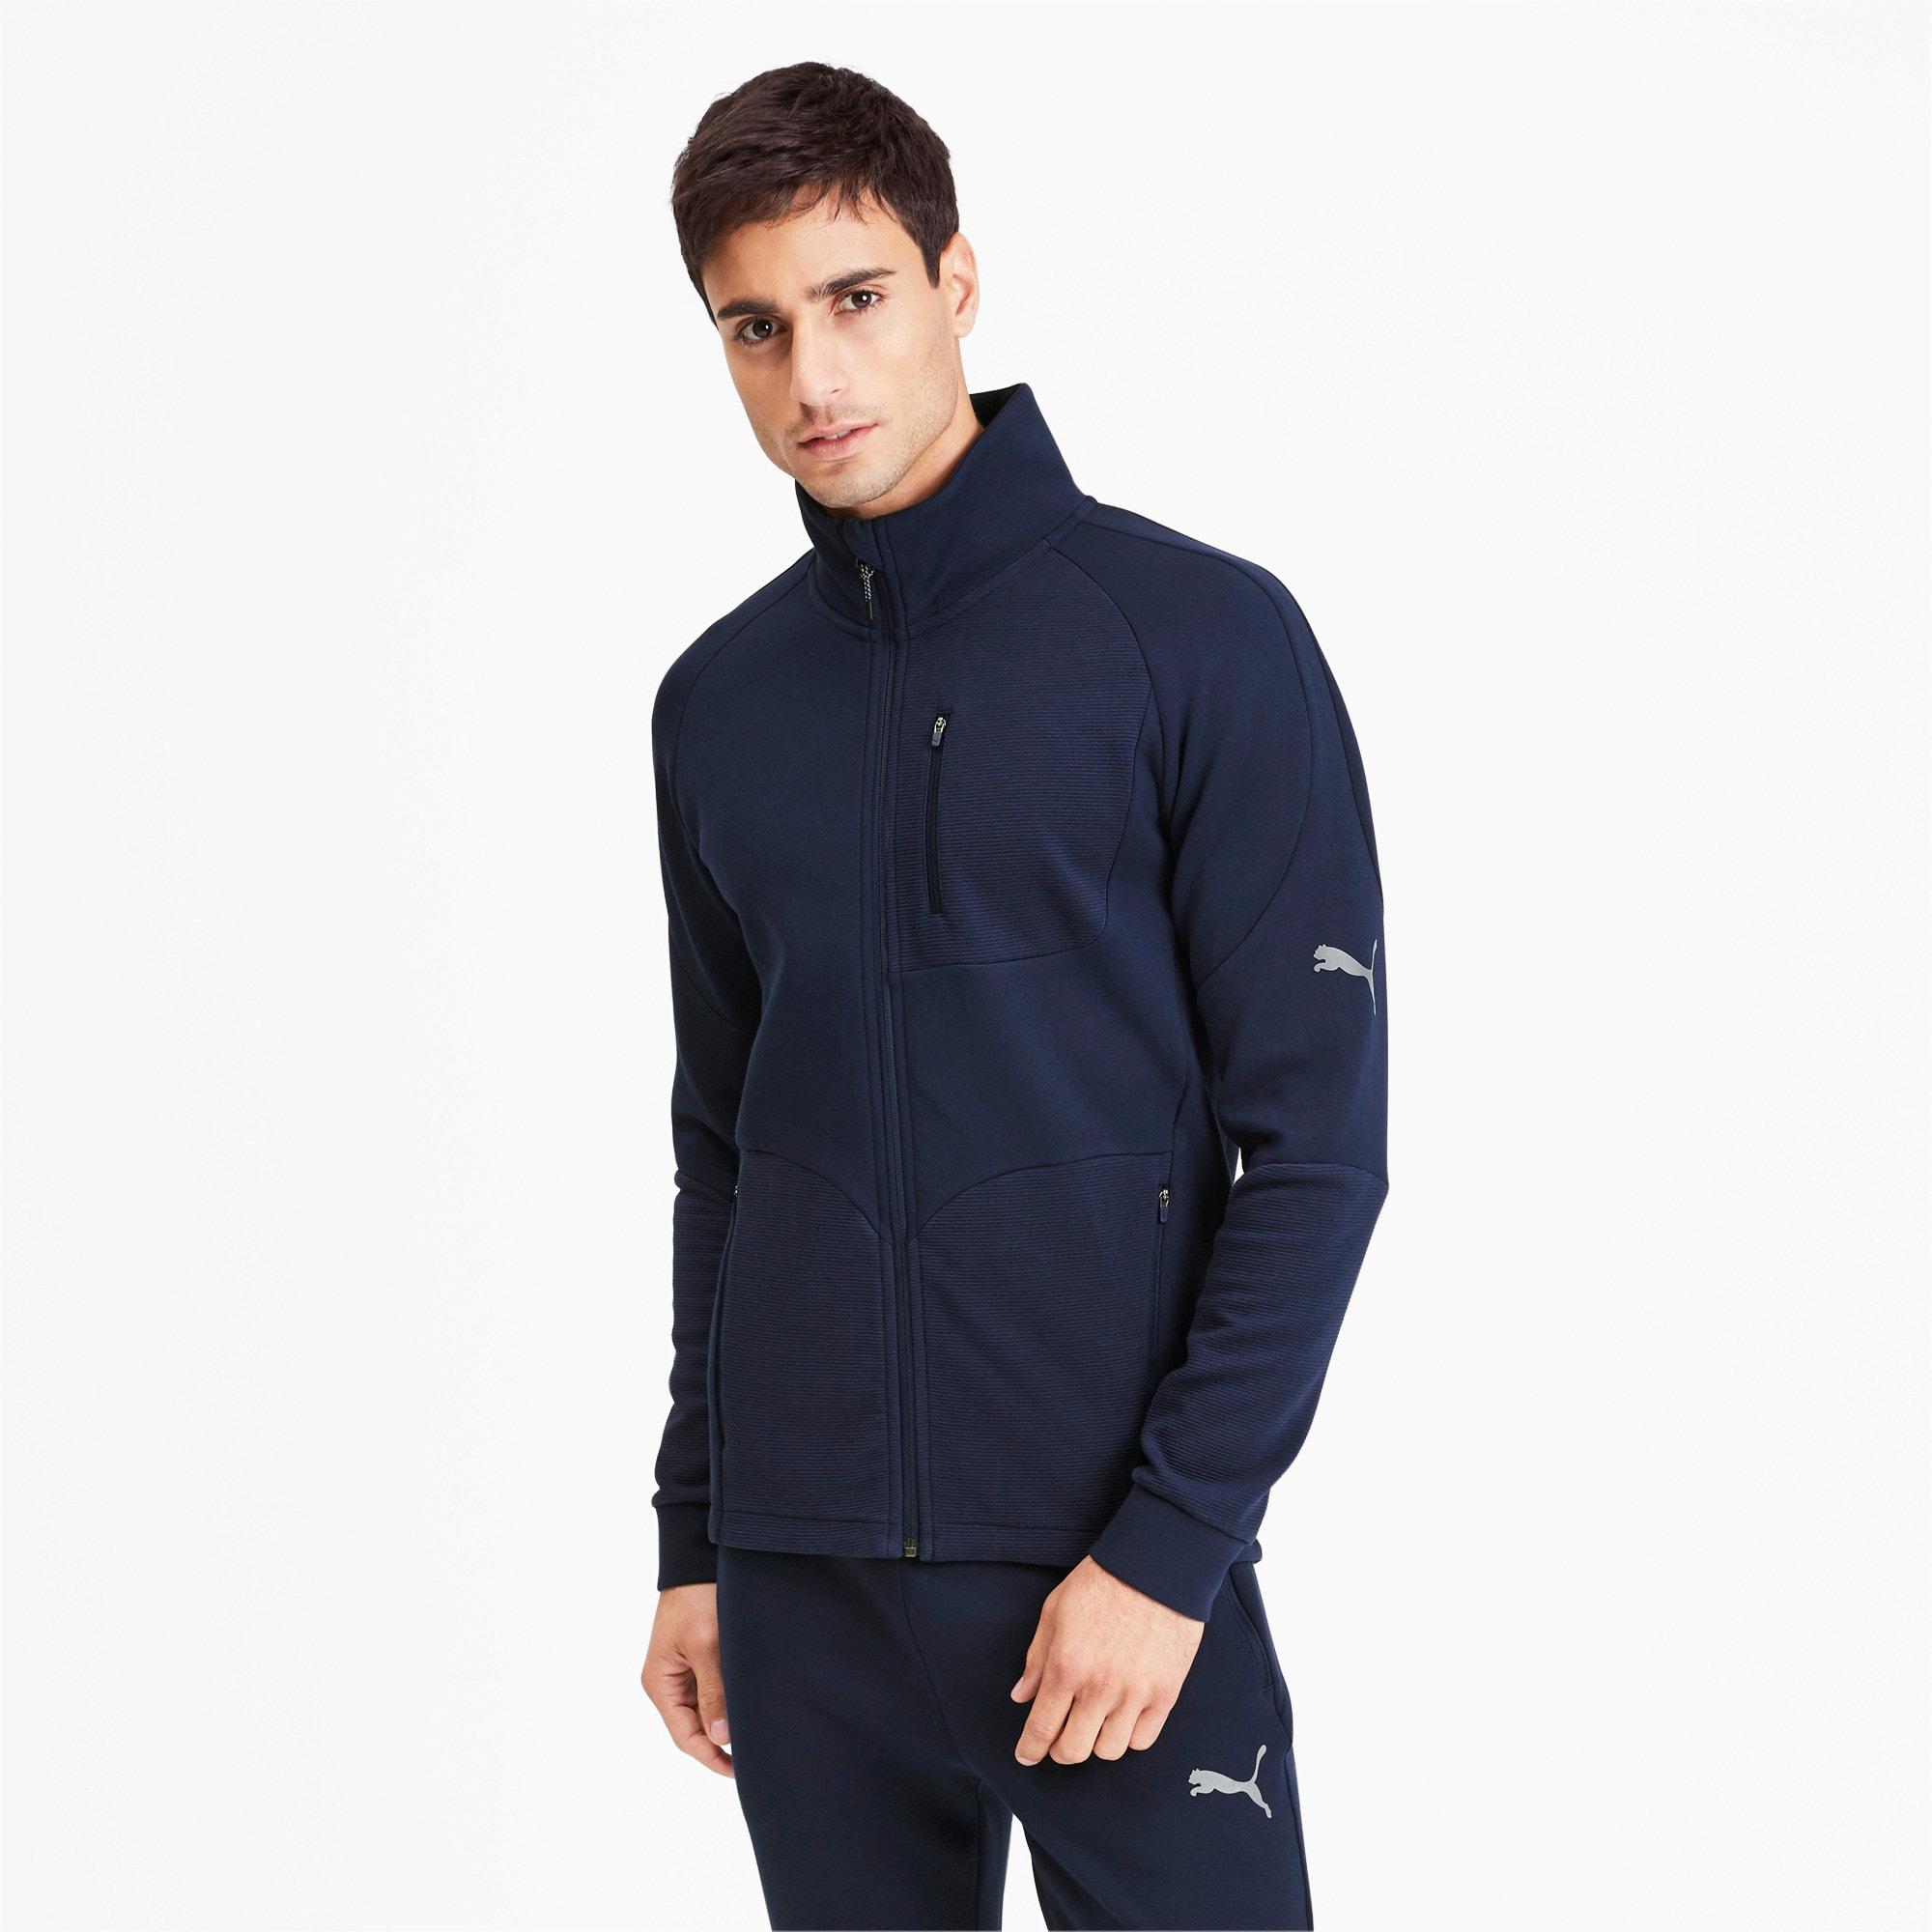 Thumbnail 1 of Evostripe Long Sleeve Men's Jacket, Peacoat, medium